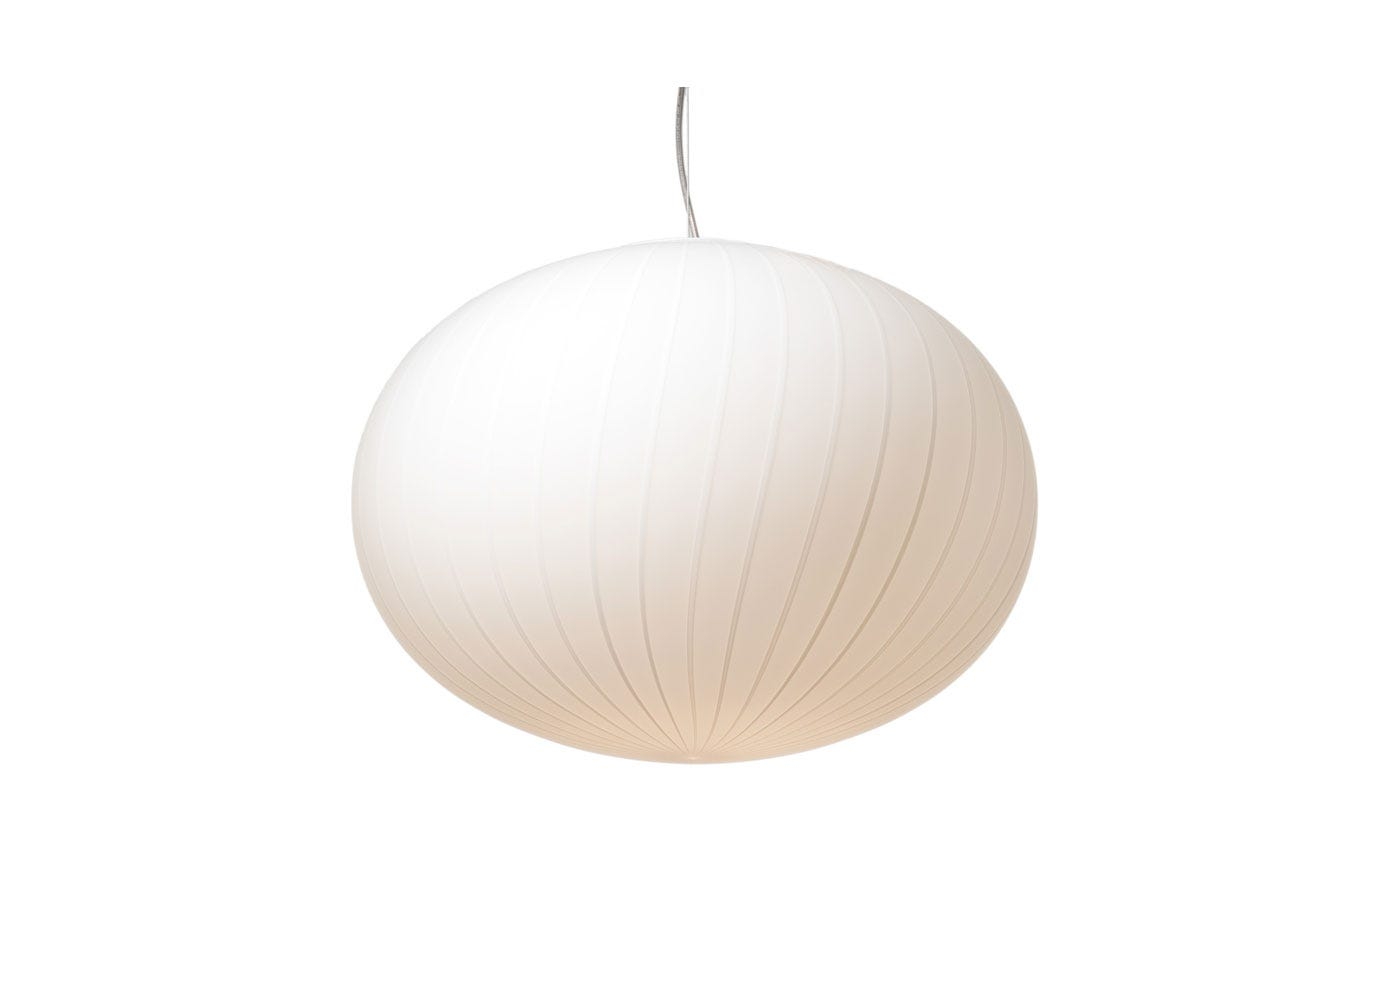 As shown: Filigrana S3 Ellipse Pendant Light Medium - White.